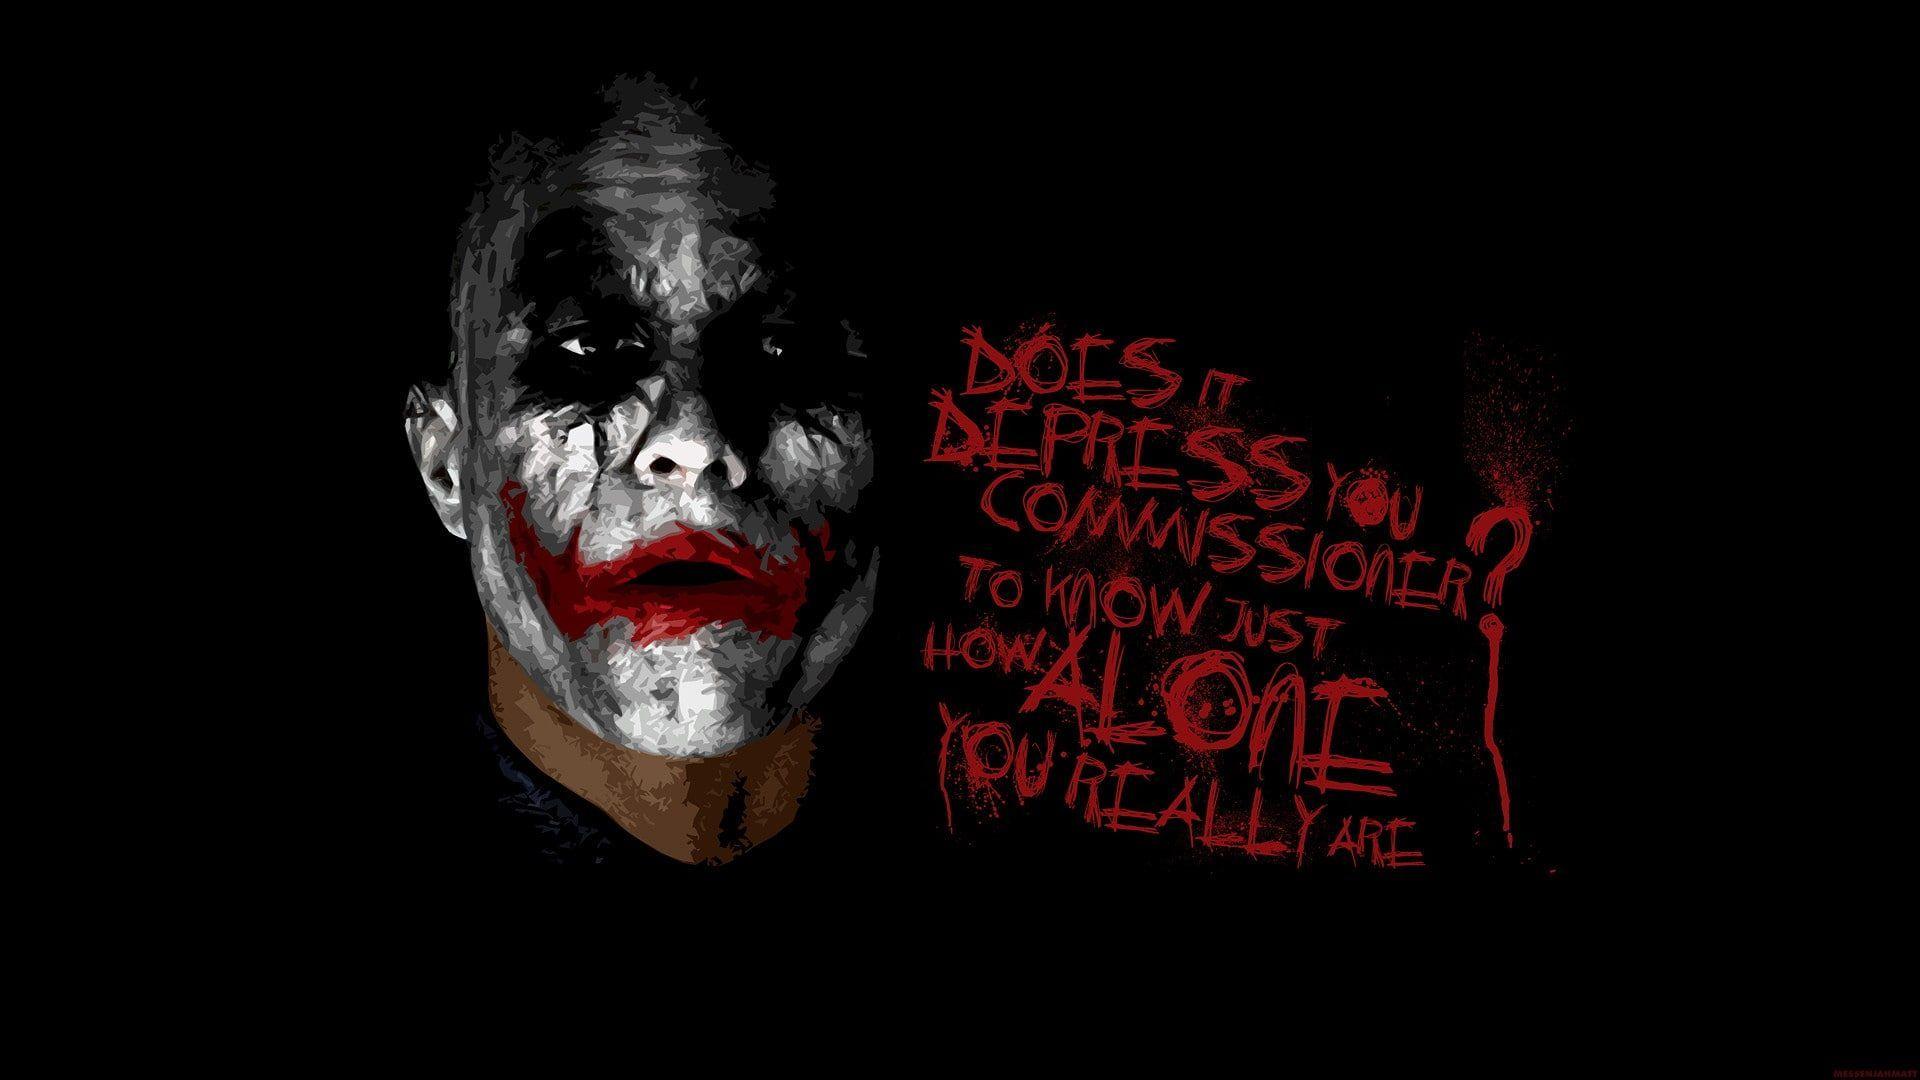 Heath Ledger Joker Wallpaper Anime Joker Typography Messenjahmatt The Dark Knight 1080p Joker Wallpapers Batman Joker Wallpaper Joker Images Hd 1080p dark knight joker wallpaper